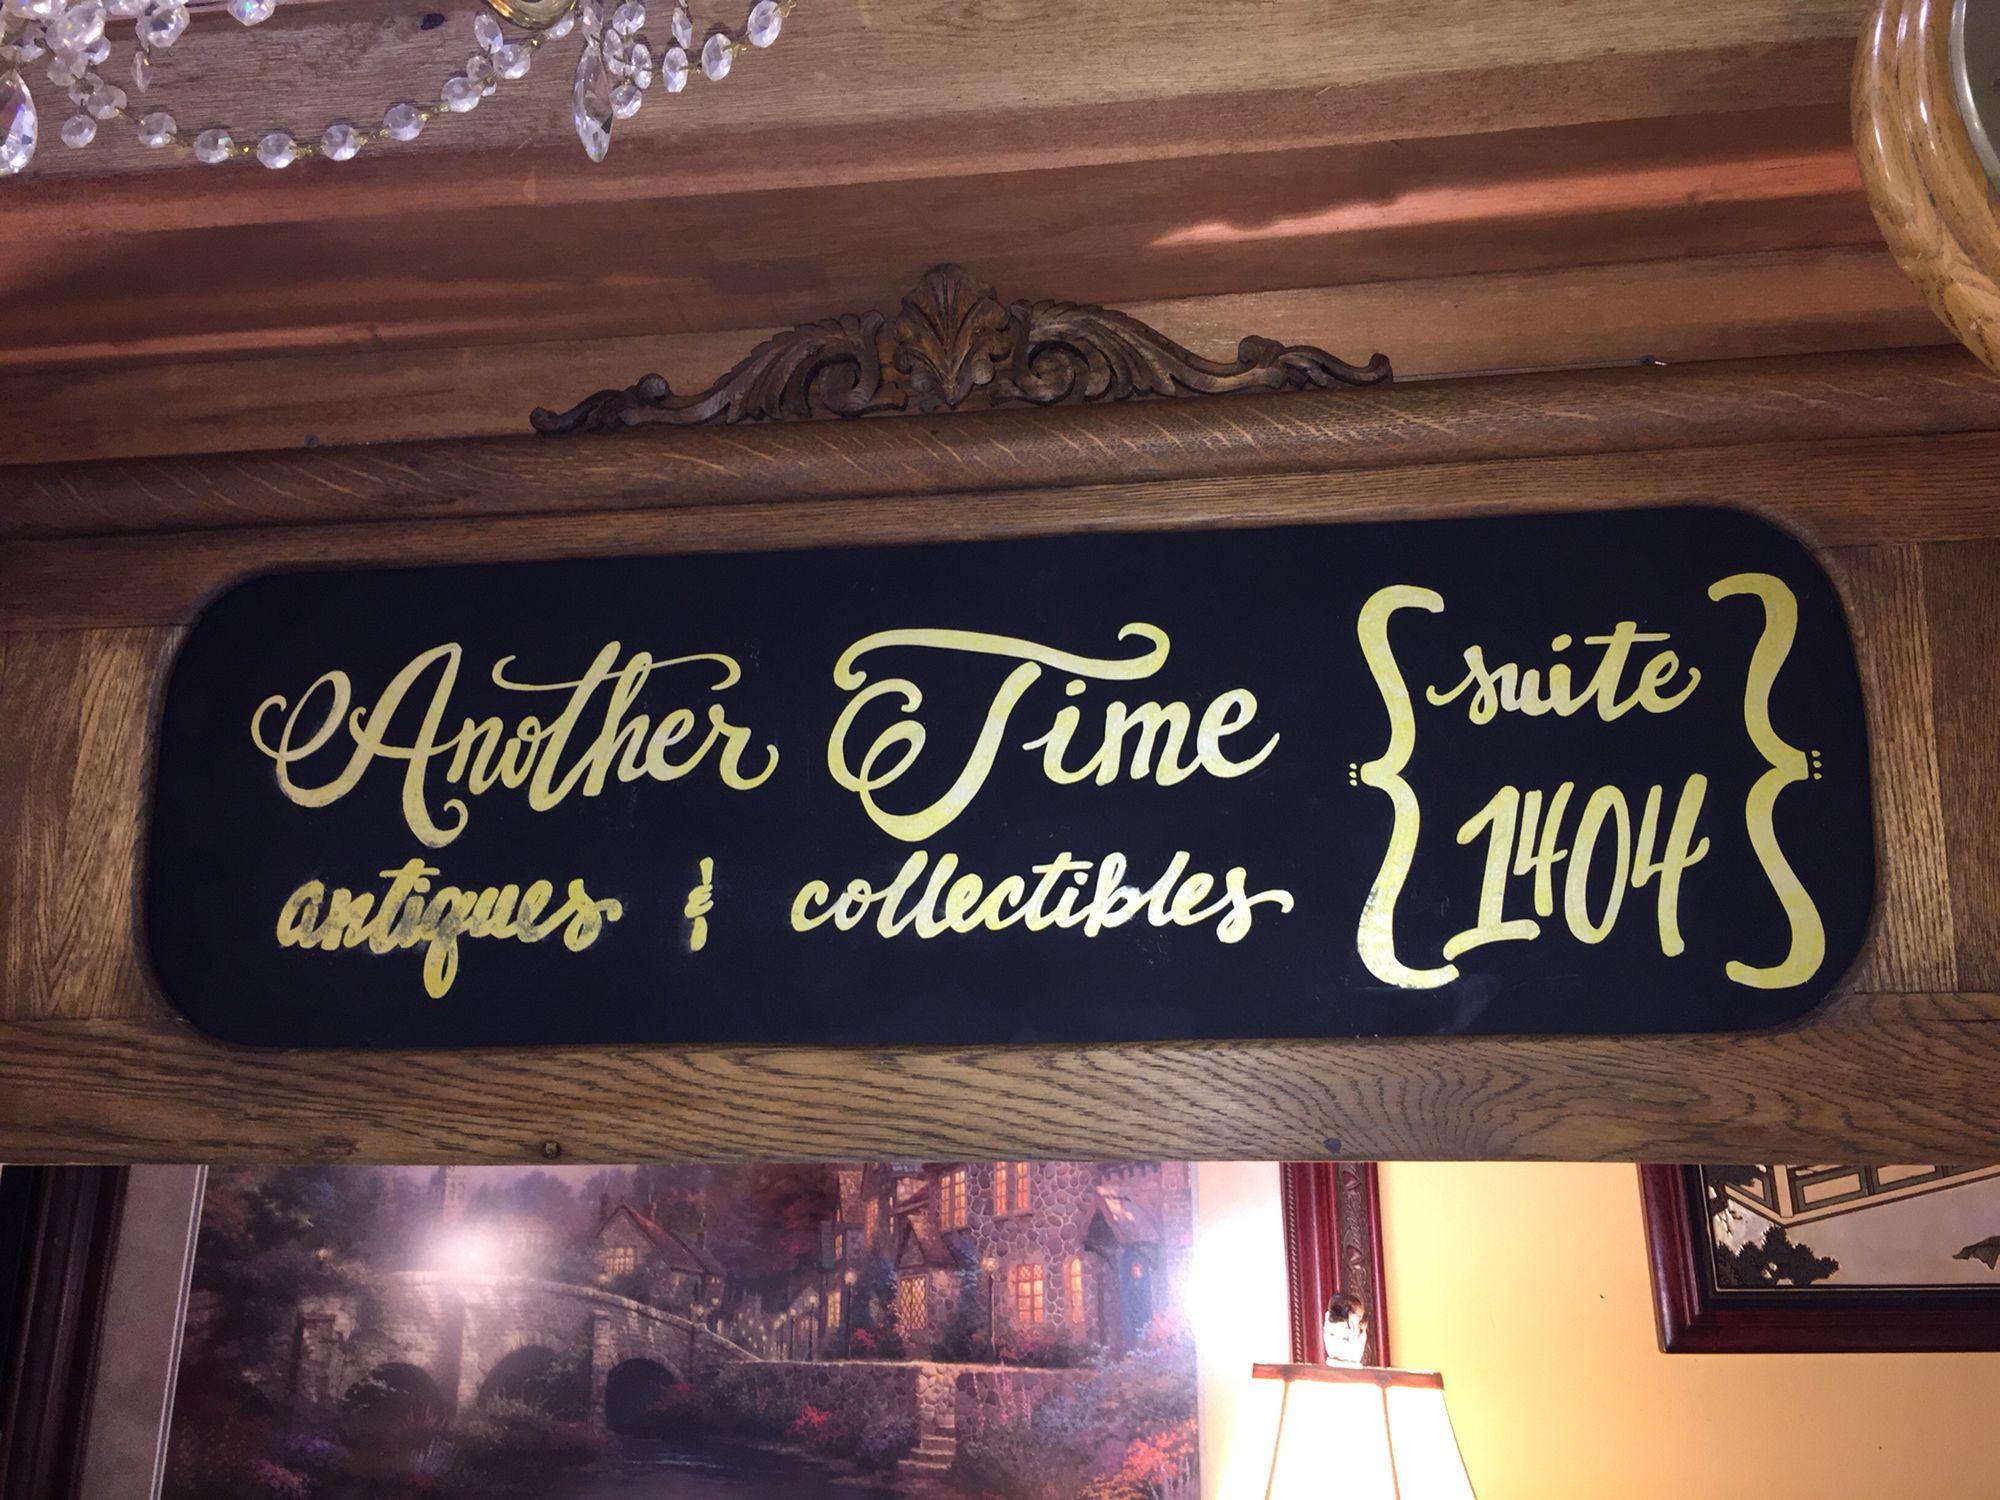 Another Time  Frisco Mercantile #anothertime #friscomercantile